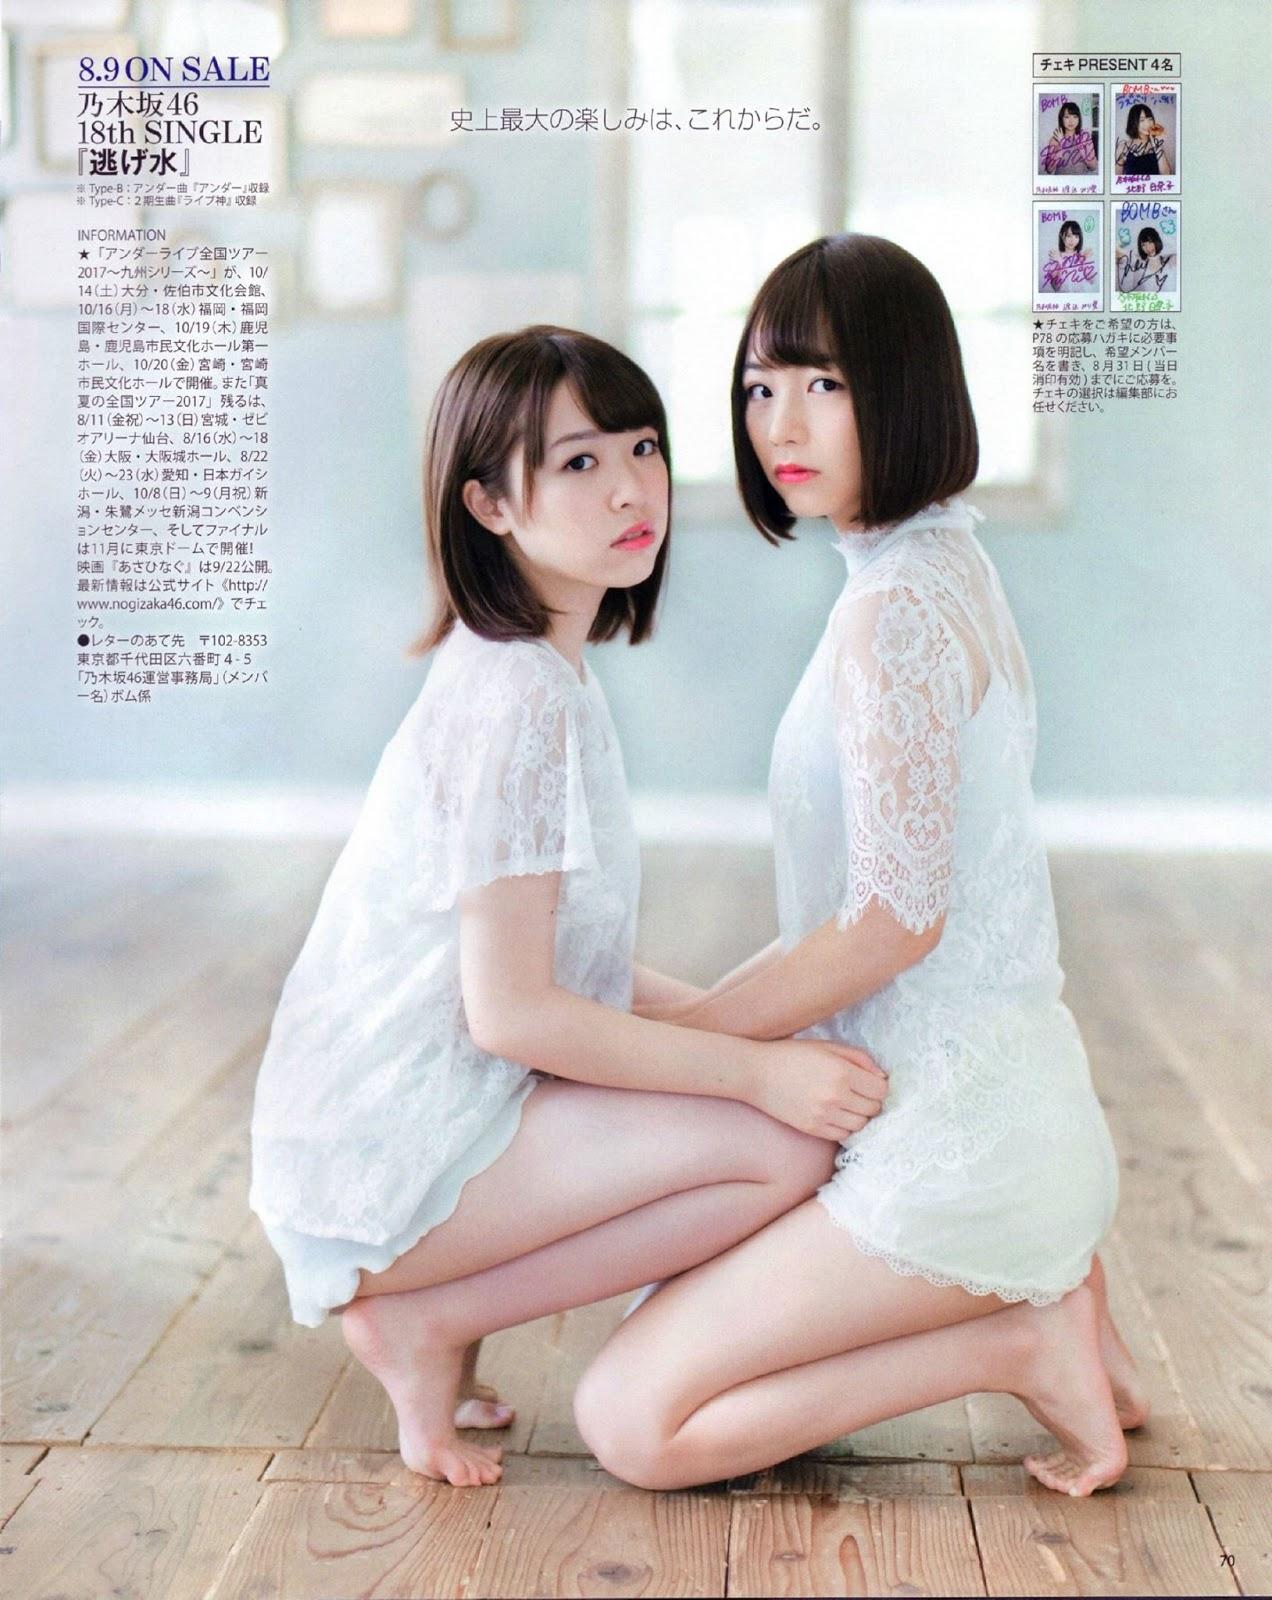 Kitano Hinako 北野日奈子, Watanabe Miria 渡辺みり愛, BOMB! 2017.09 (ボム 2017年09月号)